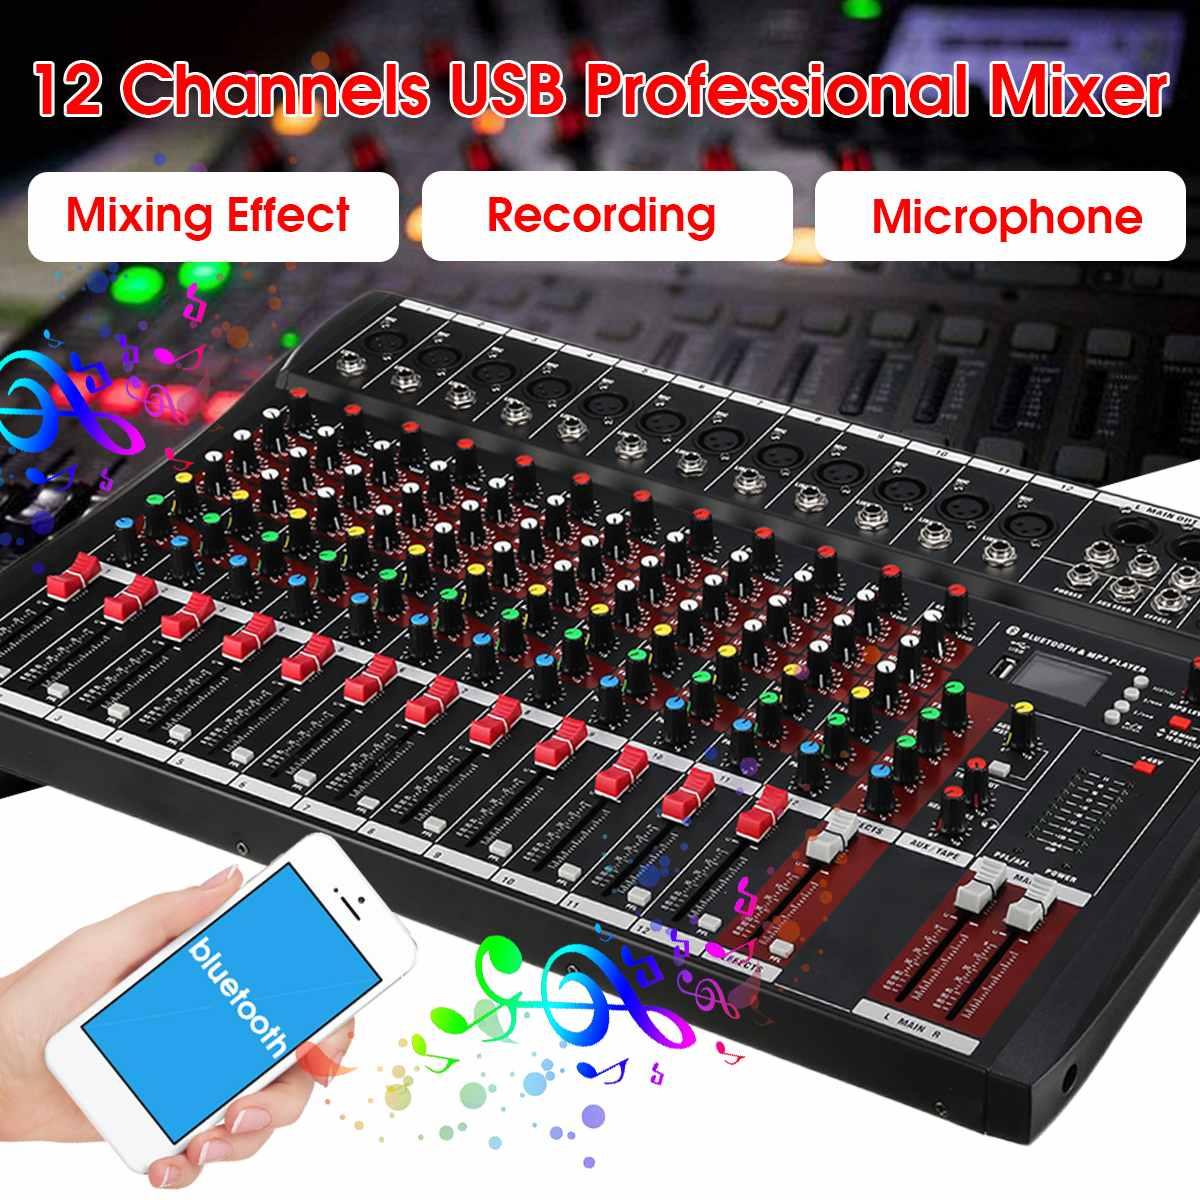 12 Channel Karaoke Audio Mixer Professional bluetooth Live Studio Mixing Console Digital Audio Mixer with USB 48V US Plug12 Channel Karaoke Audio Mixer Professional bluetooth Live Studio Mixing Console Digital Audio Mixer with USB 48V US Plug